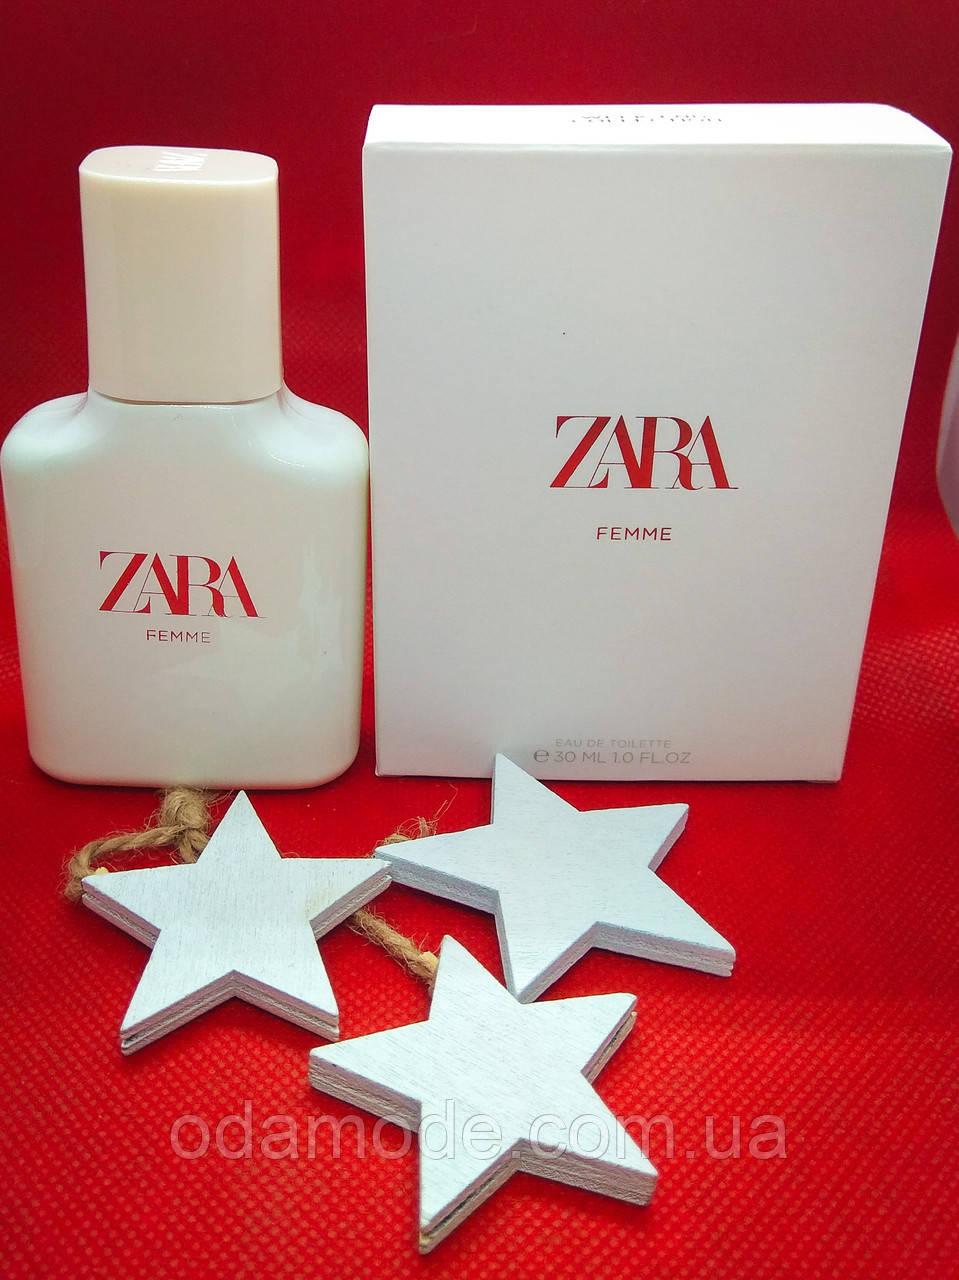 Духи Zara Femme edt Испания 30мл